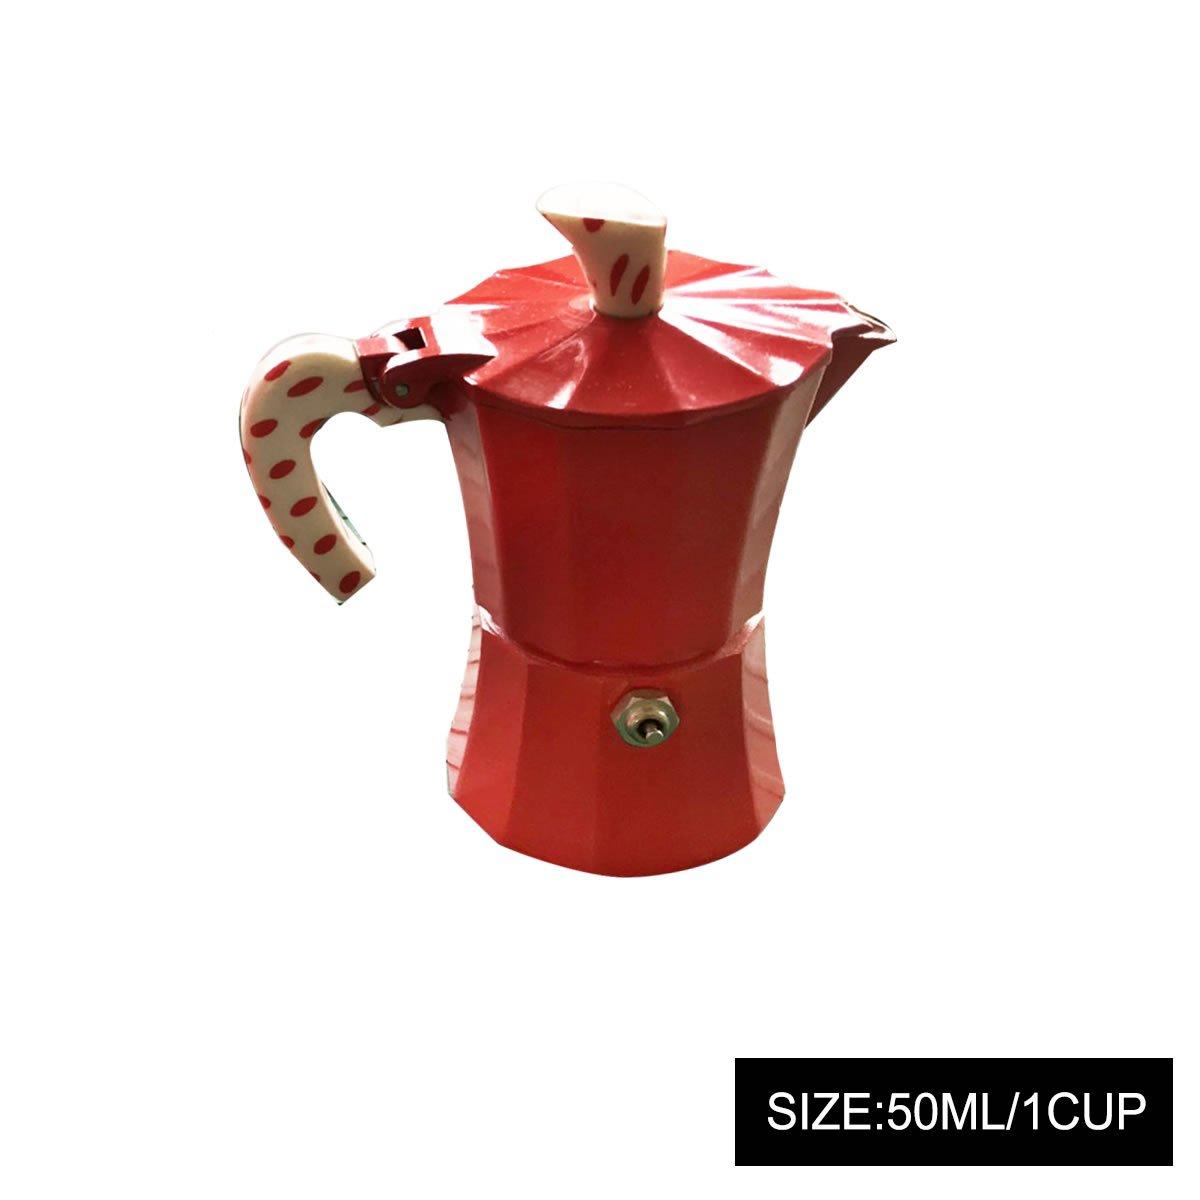 GOODFEER LONGLISHENG 1 Cup Mocha Pot with Polka Dot Printed Handle Aluminum Alloy Coffee Maker